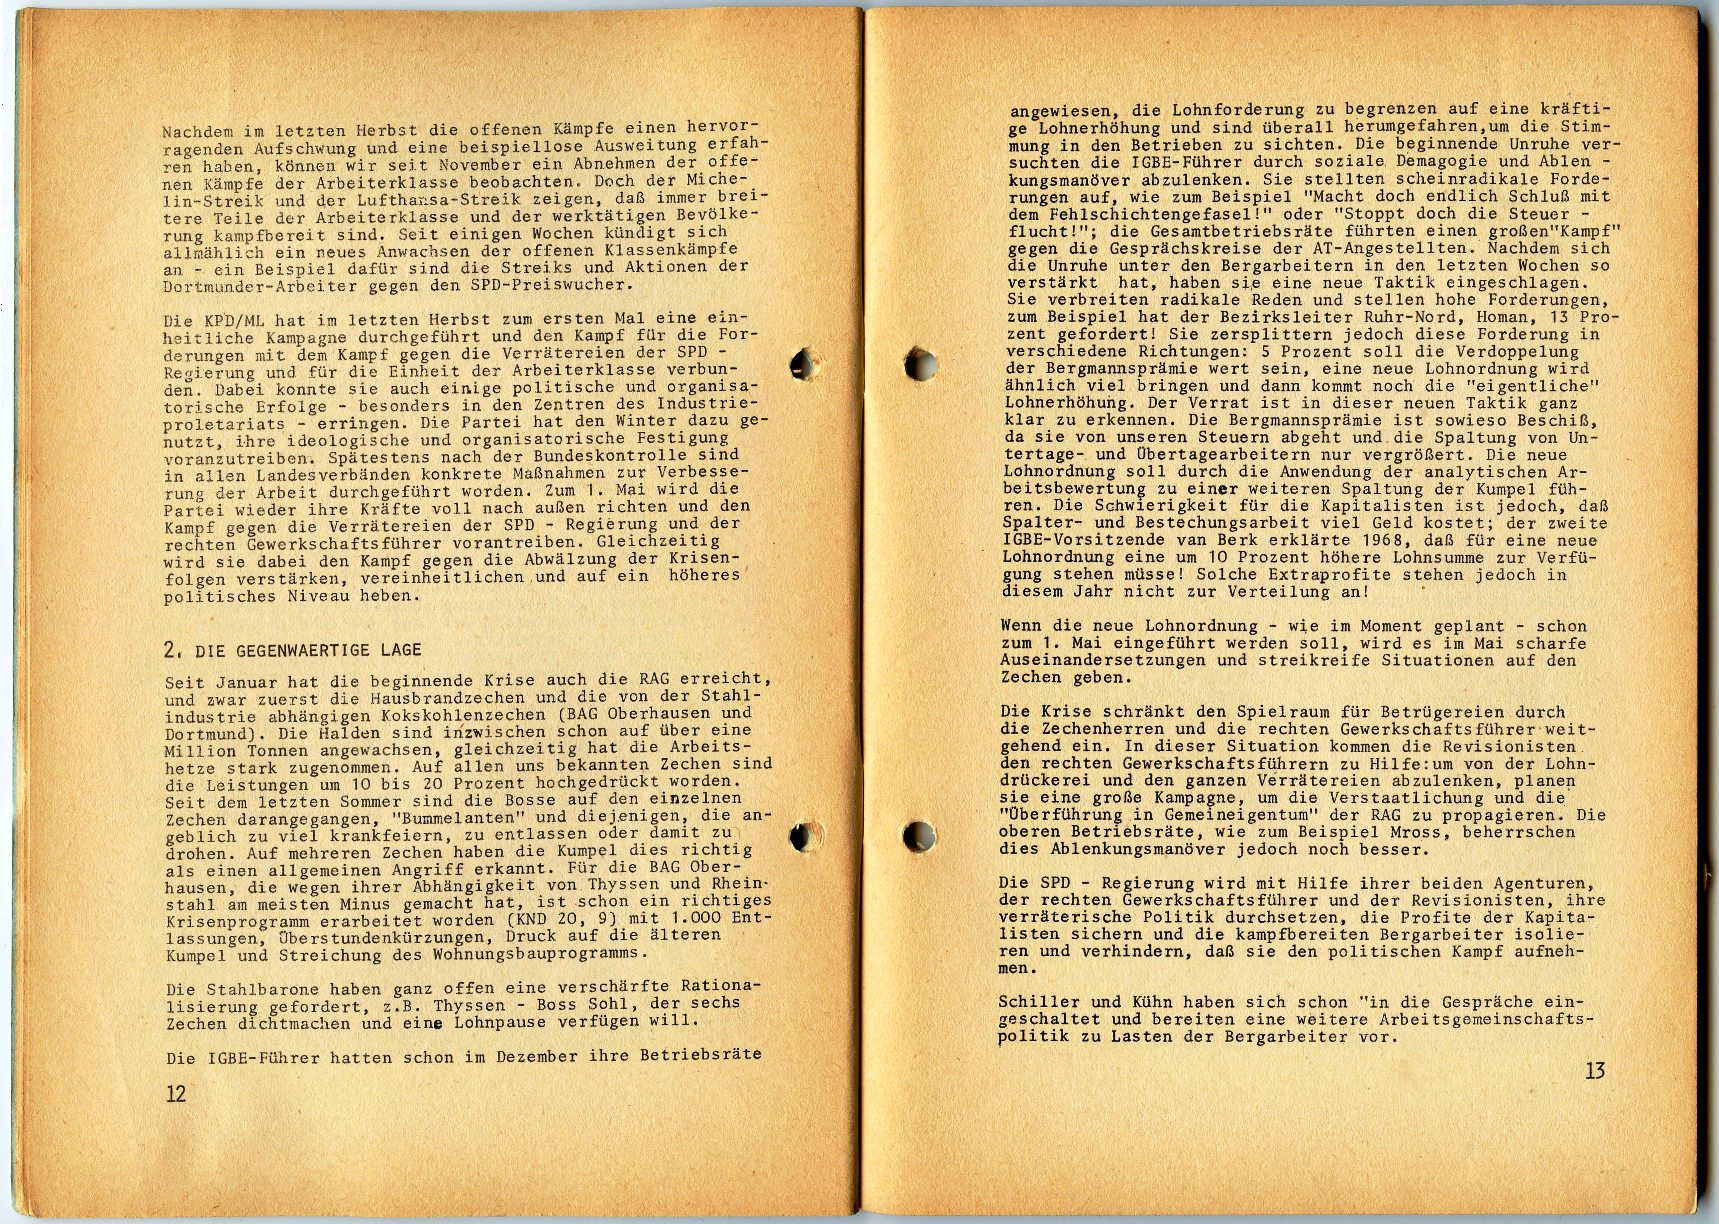 ZB_Parteiarbeiter_1971_04_07